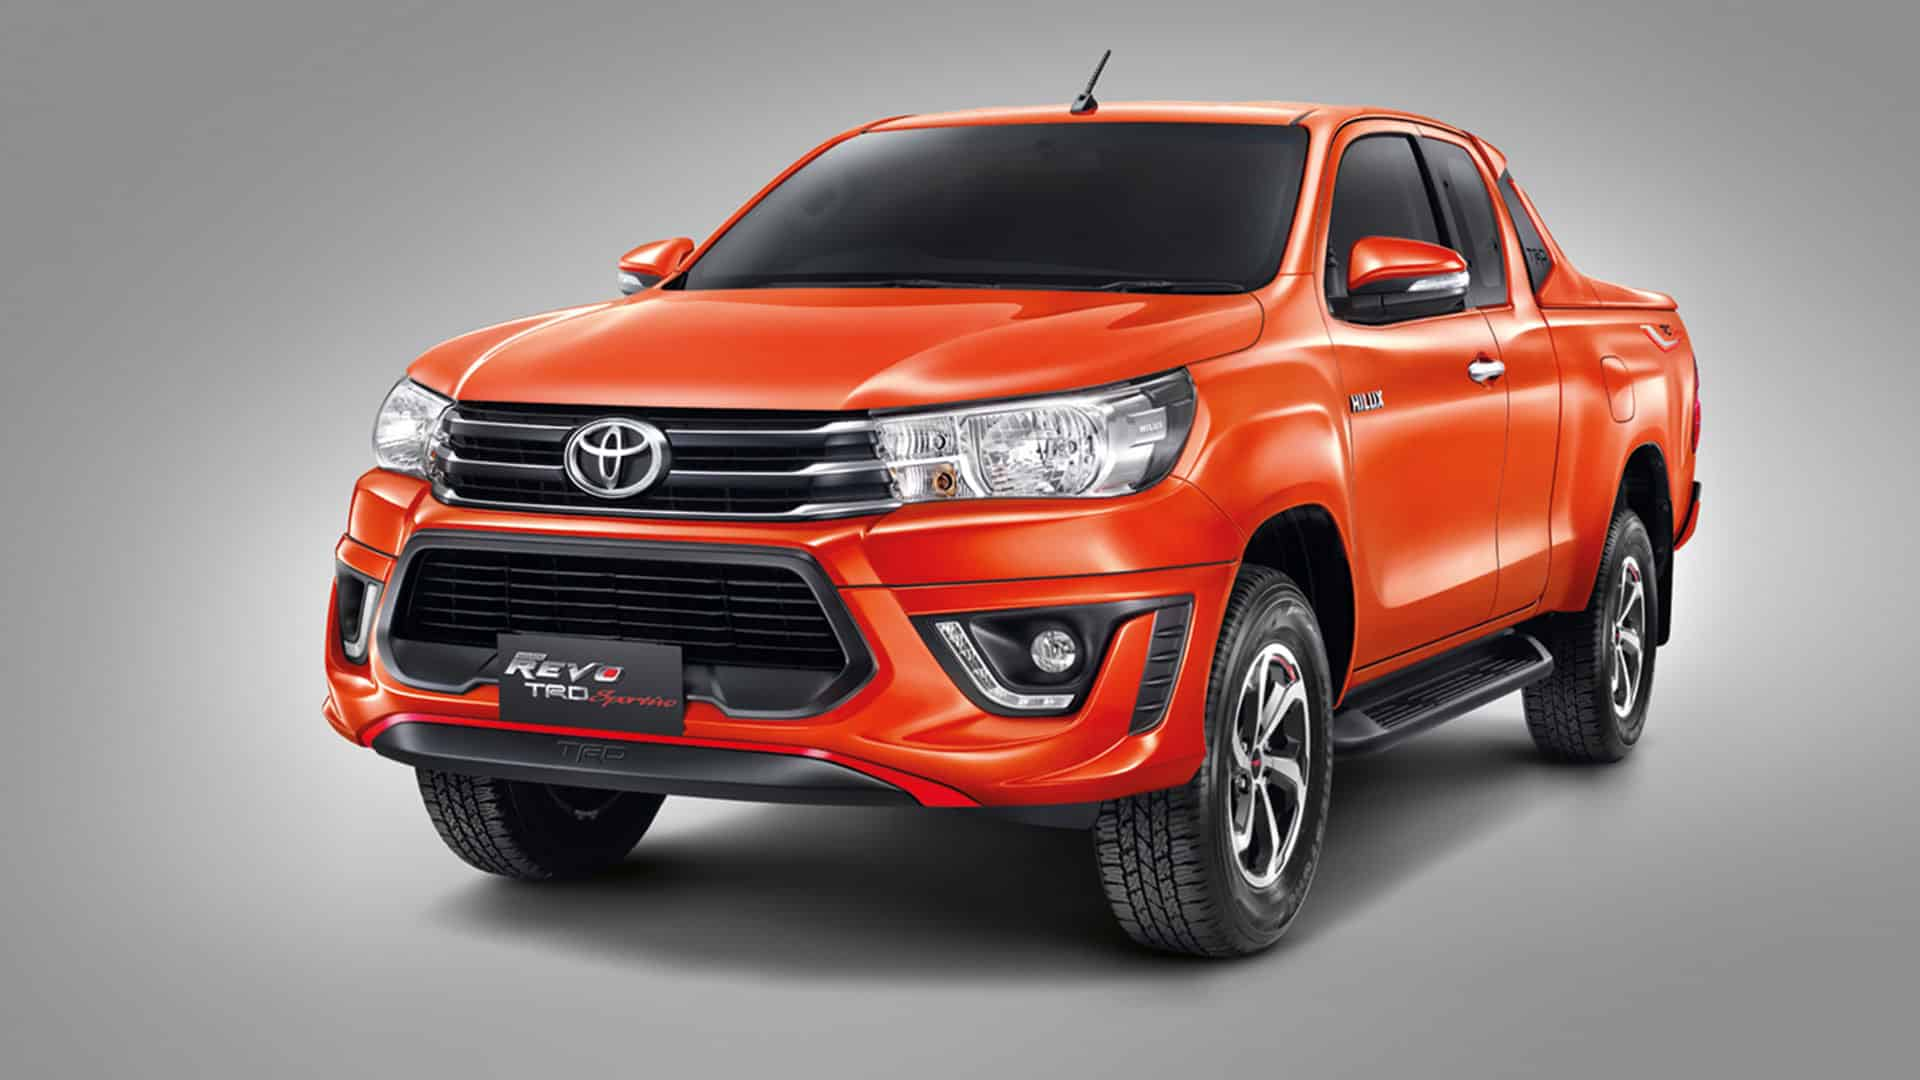 Toyota Hilux Revo Smart Cab Trd Sportivo